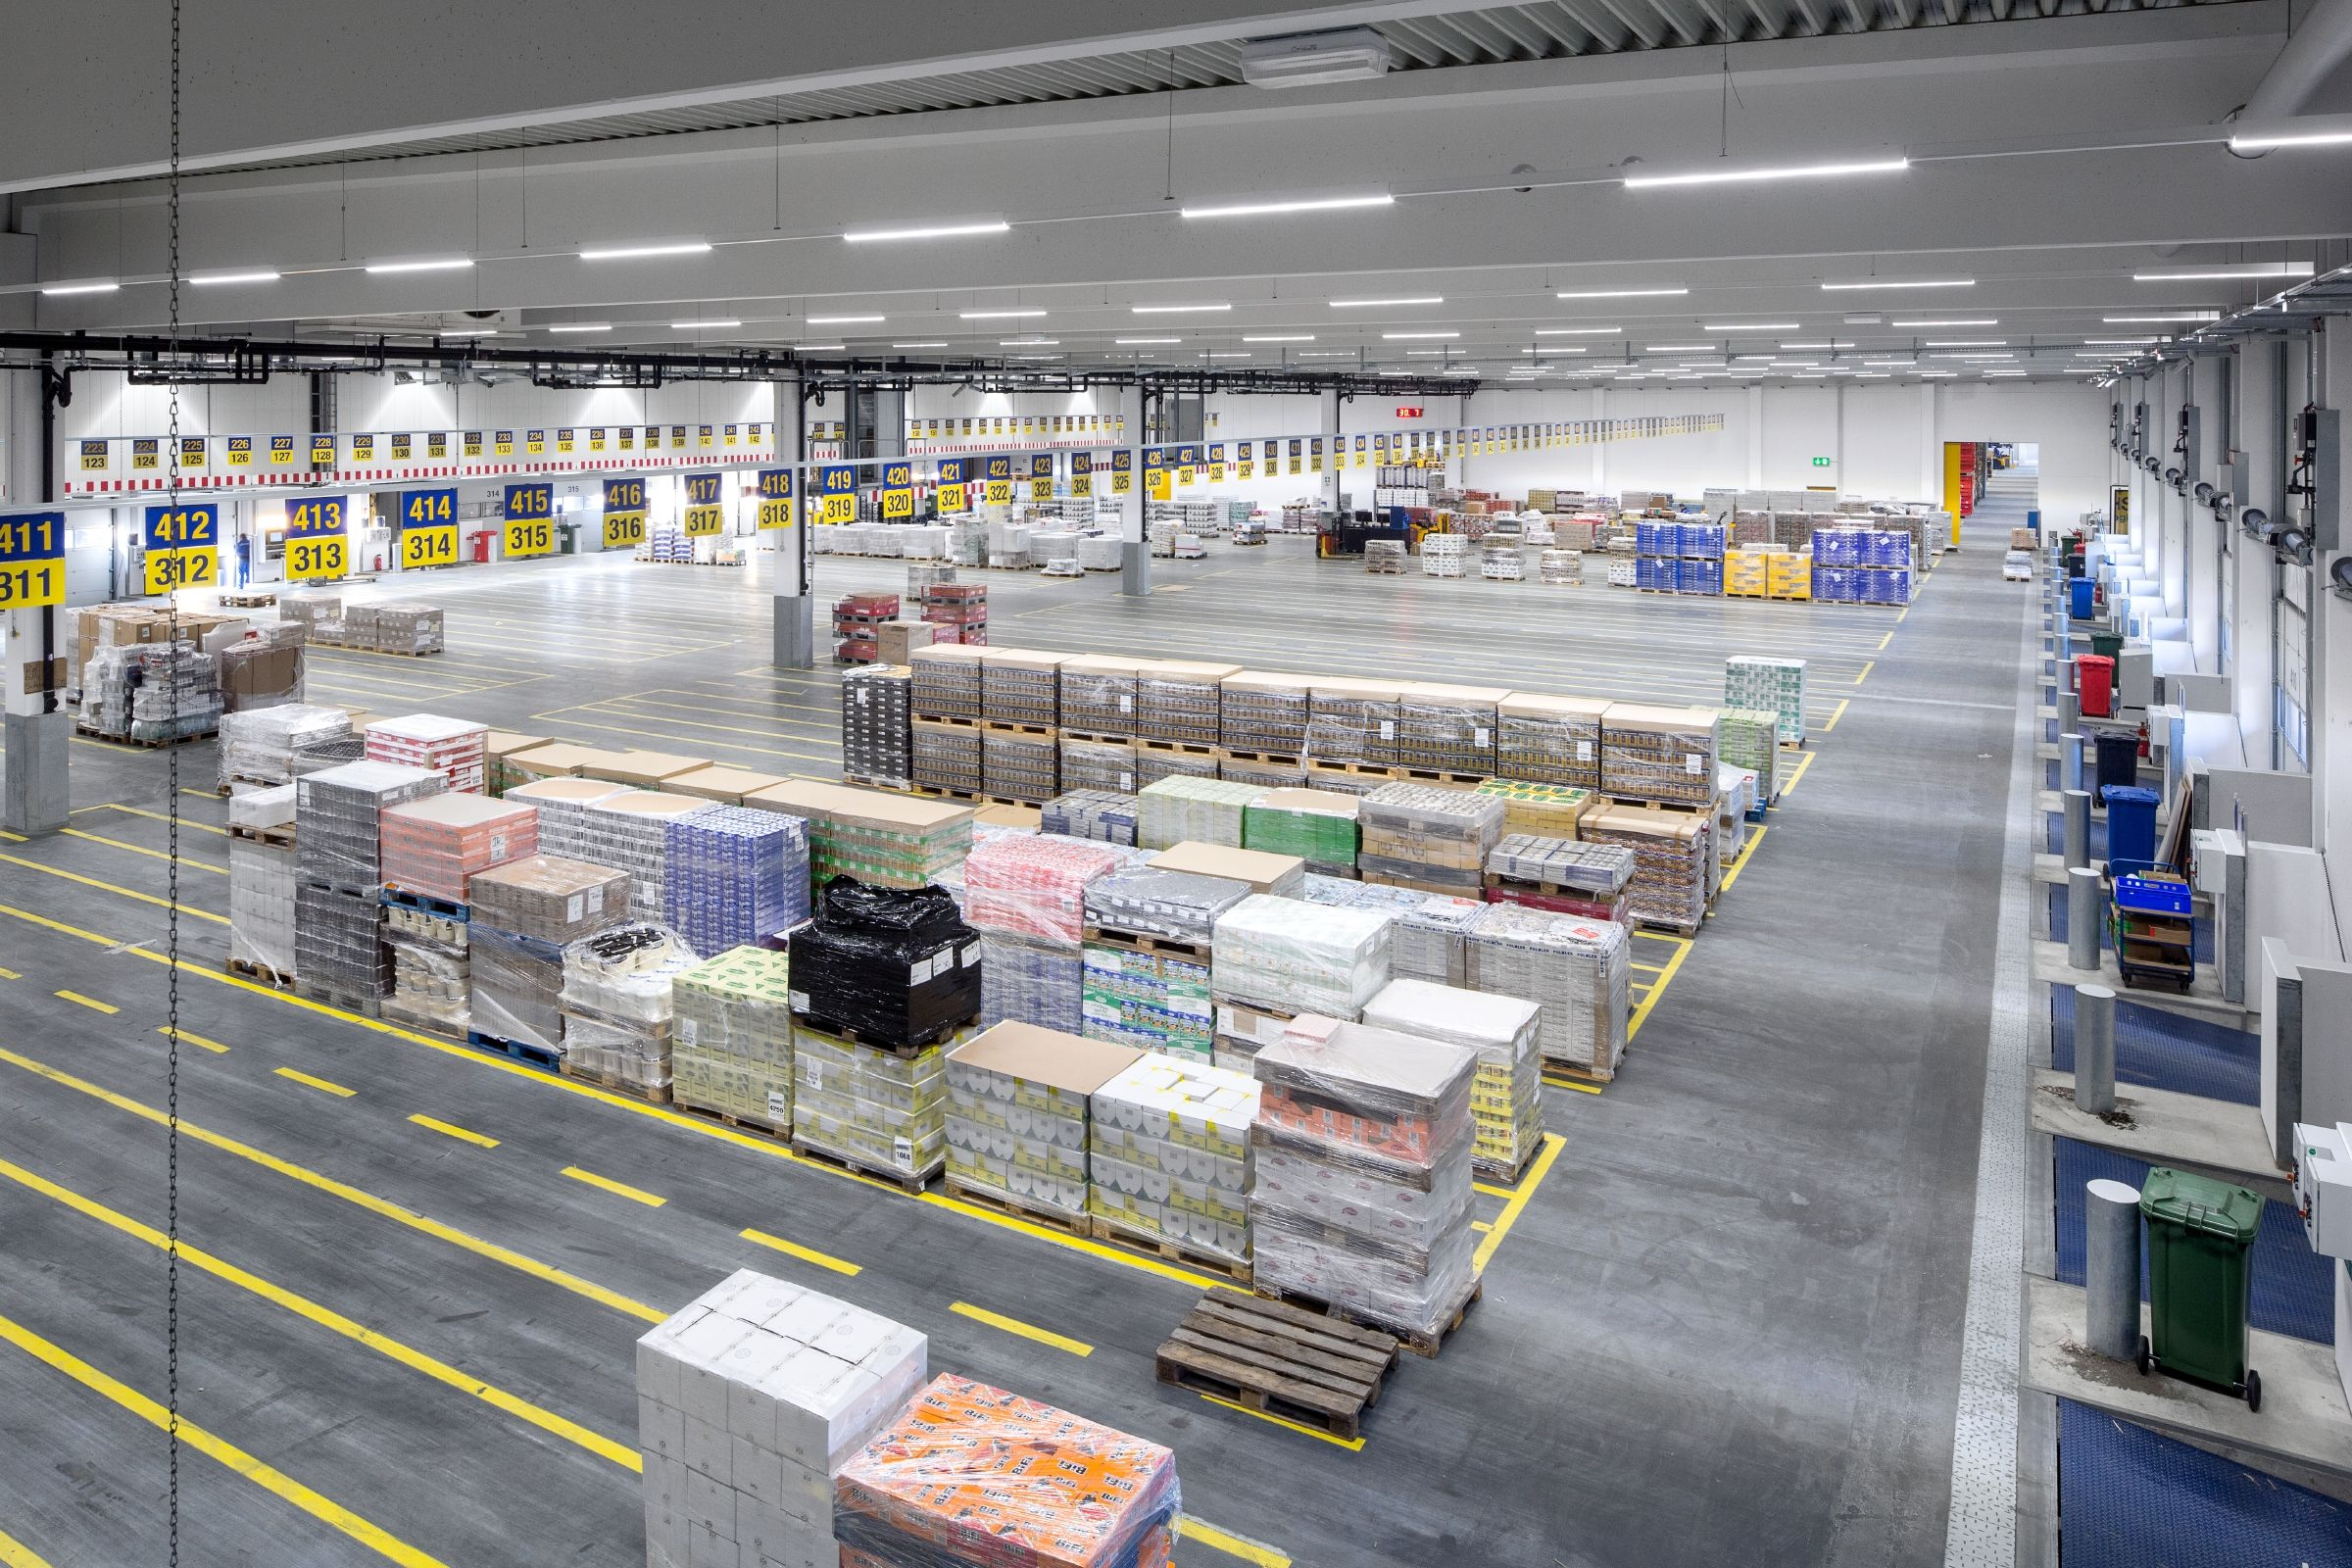 dachser logistic centre berlin germany dachser logistikzentrum berlin deutschland. Black Bedroom Furniture Sets. Home Design Ideas